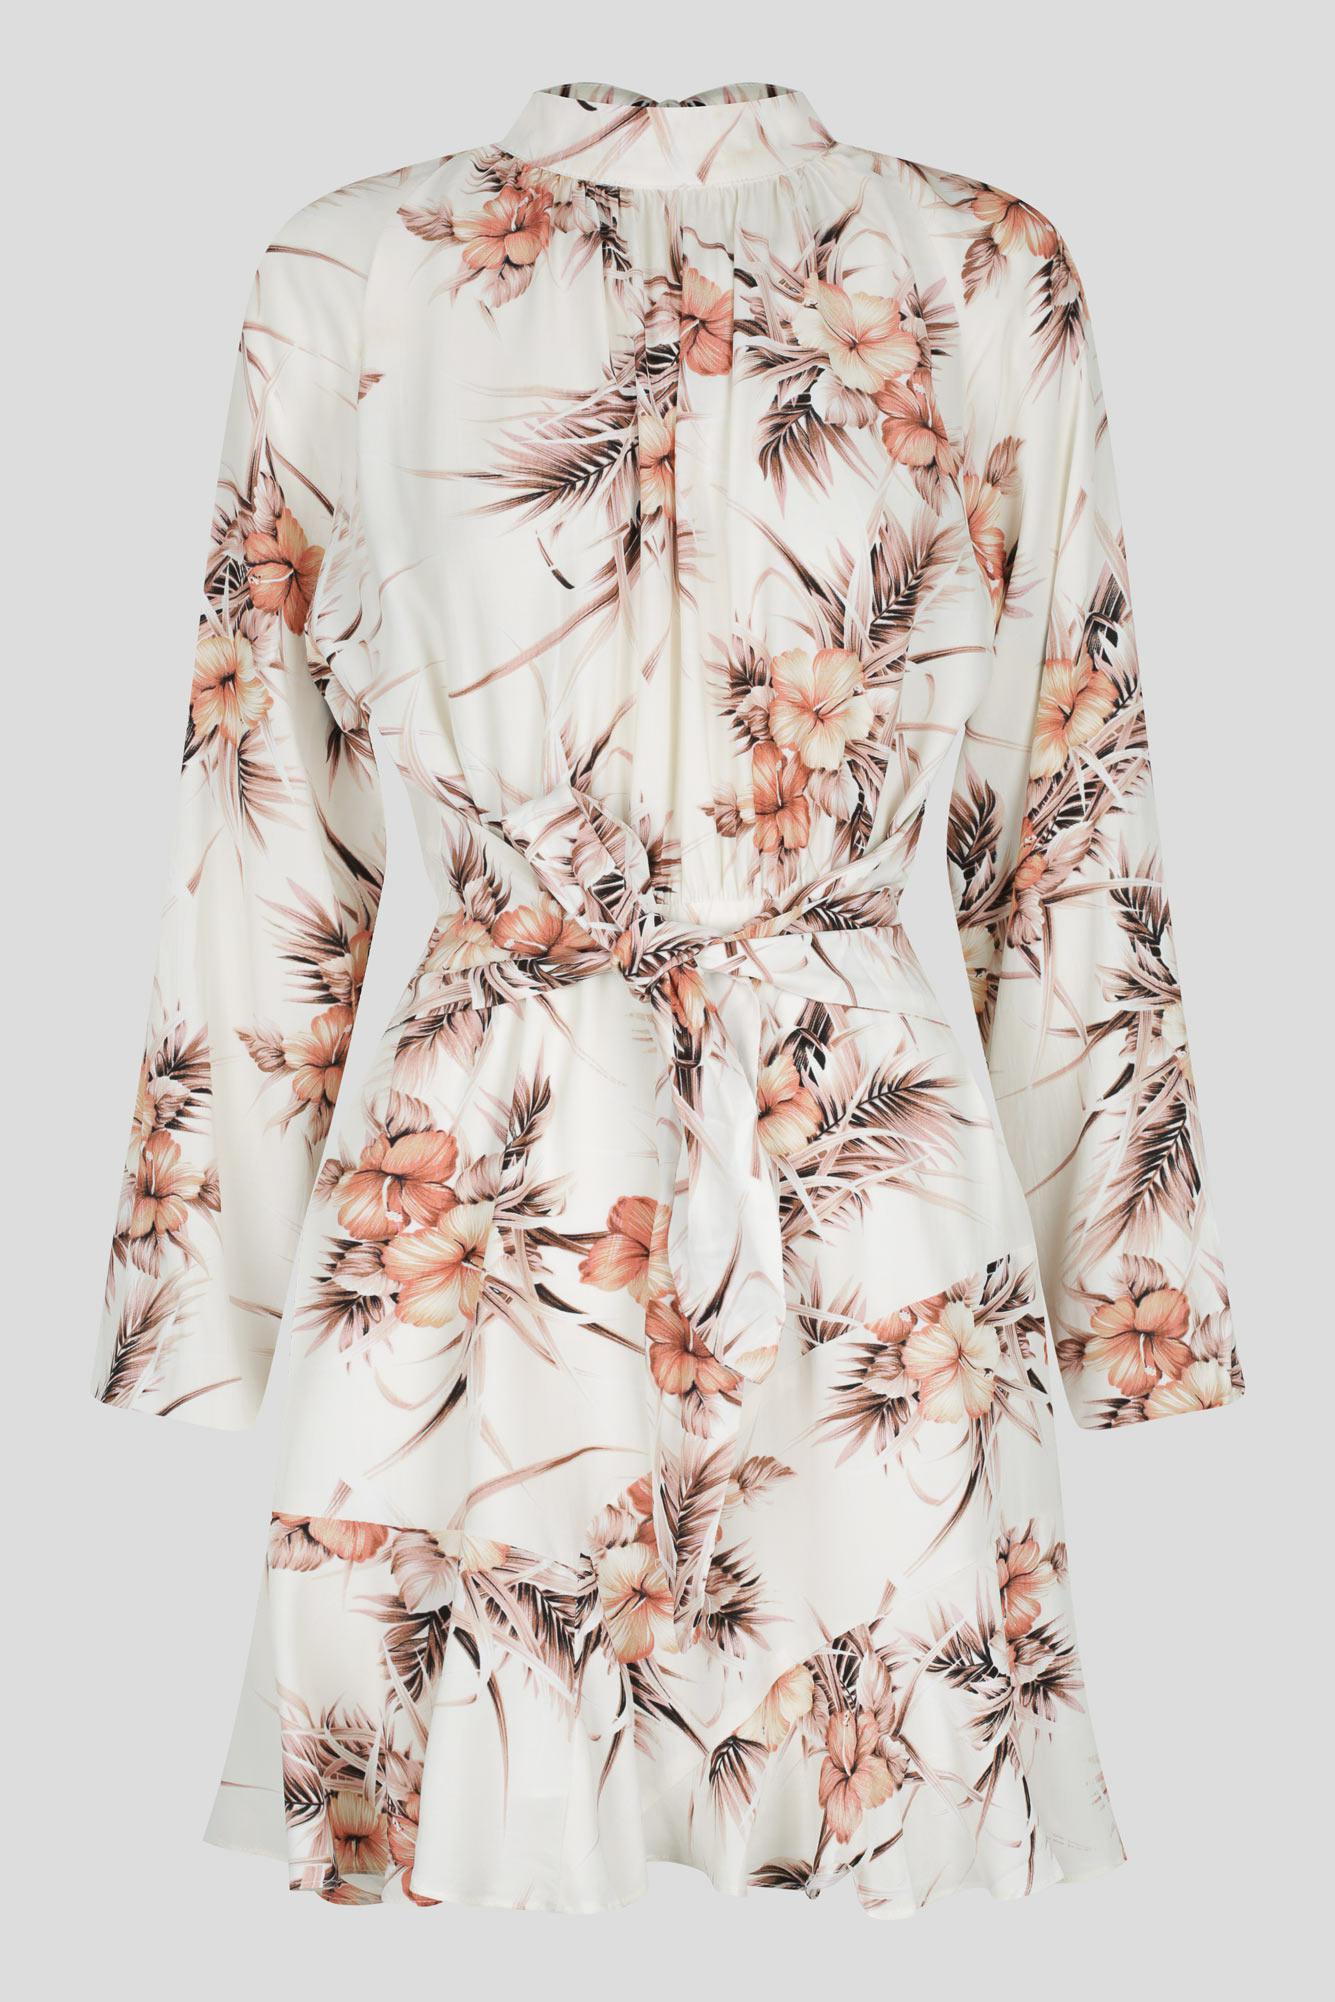 Arancia Dress Ladies Dress Colour is White Floral Print